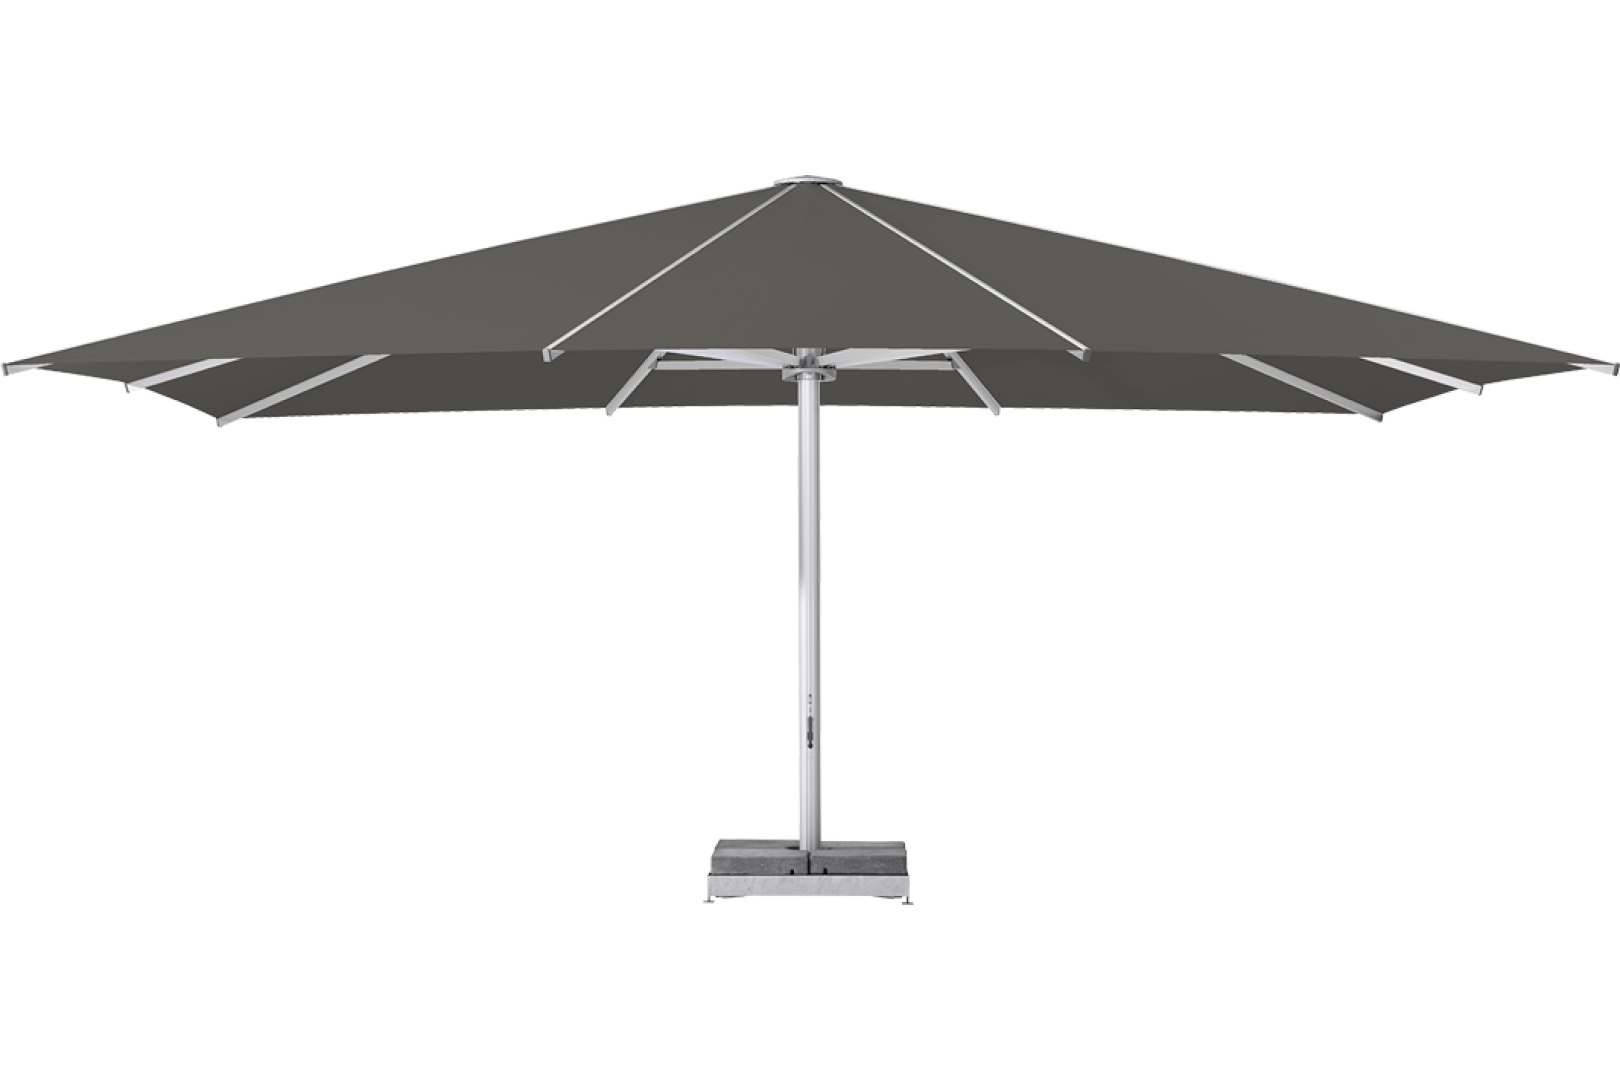 Palazzo Royal Giant Maarket Umbrella